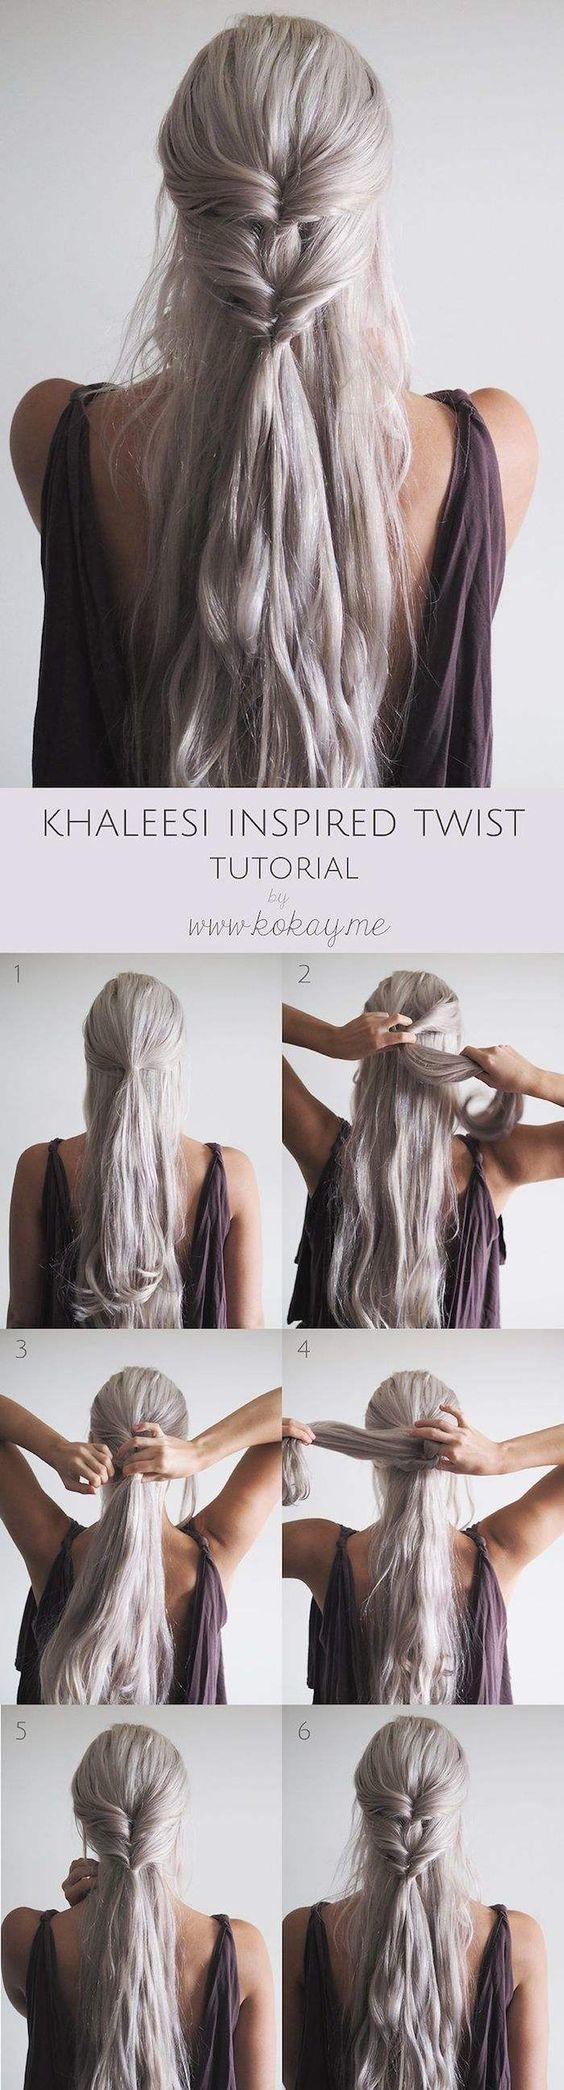 Gorgeousxox hair tutorials pinterest hair style popular